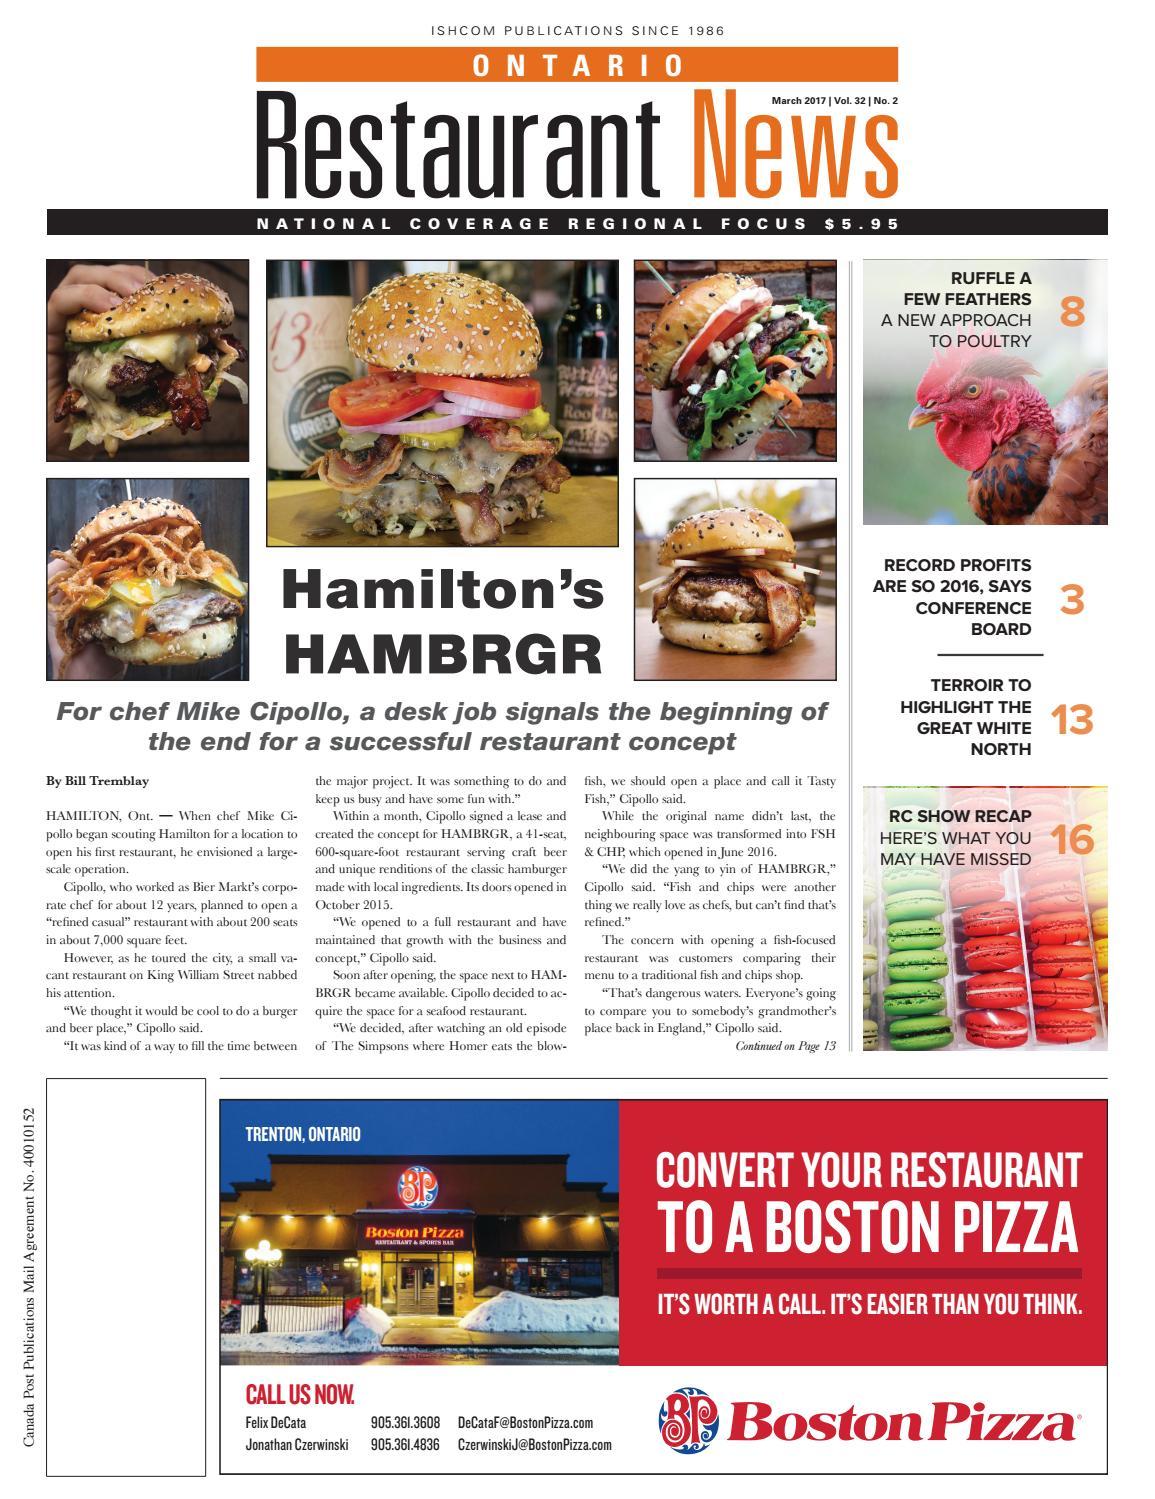 Ontario Restaurant News March 2017 by Ishcom Publications - issuu